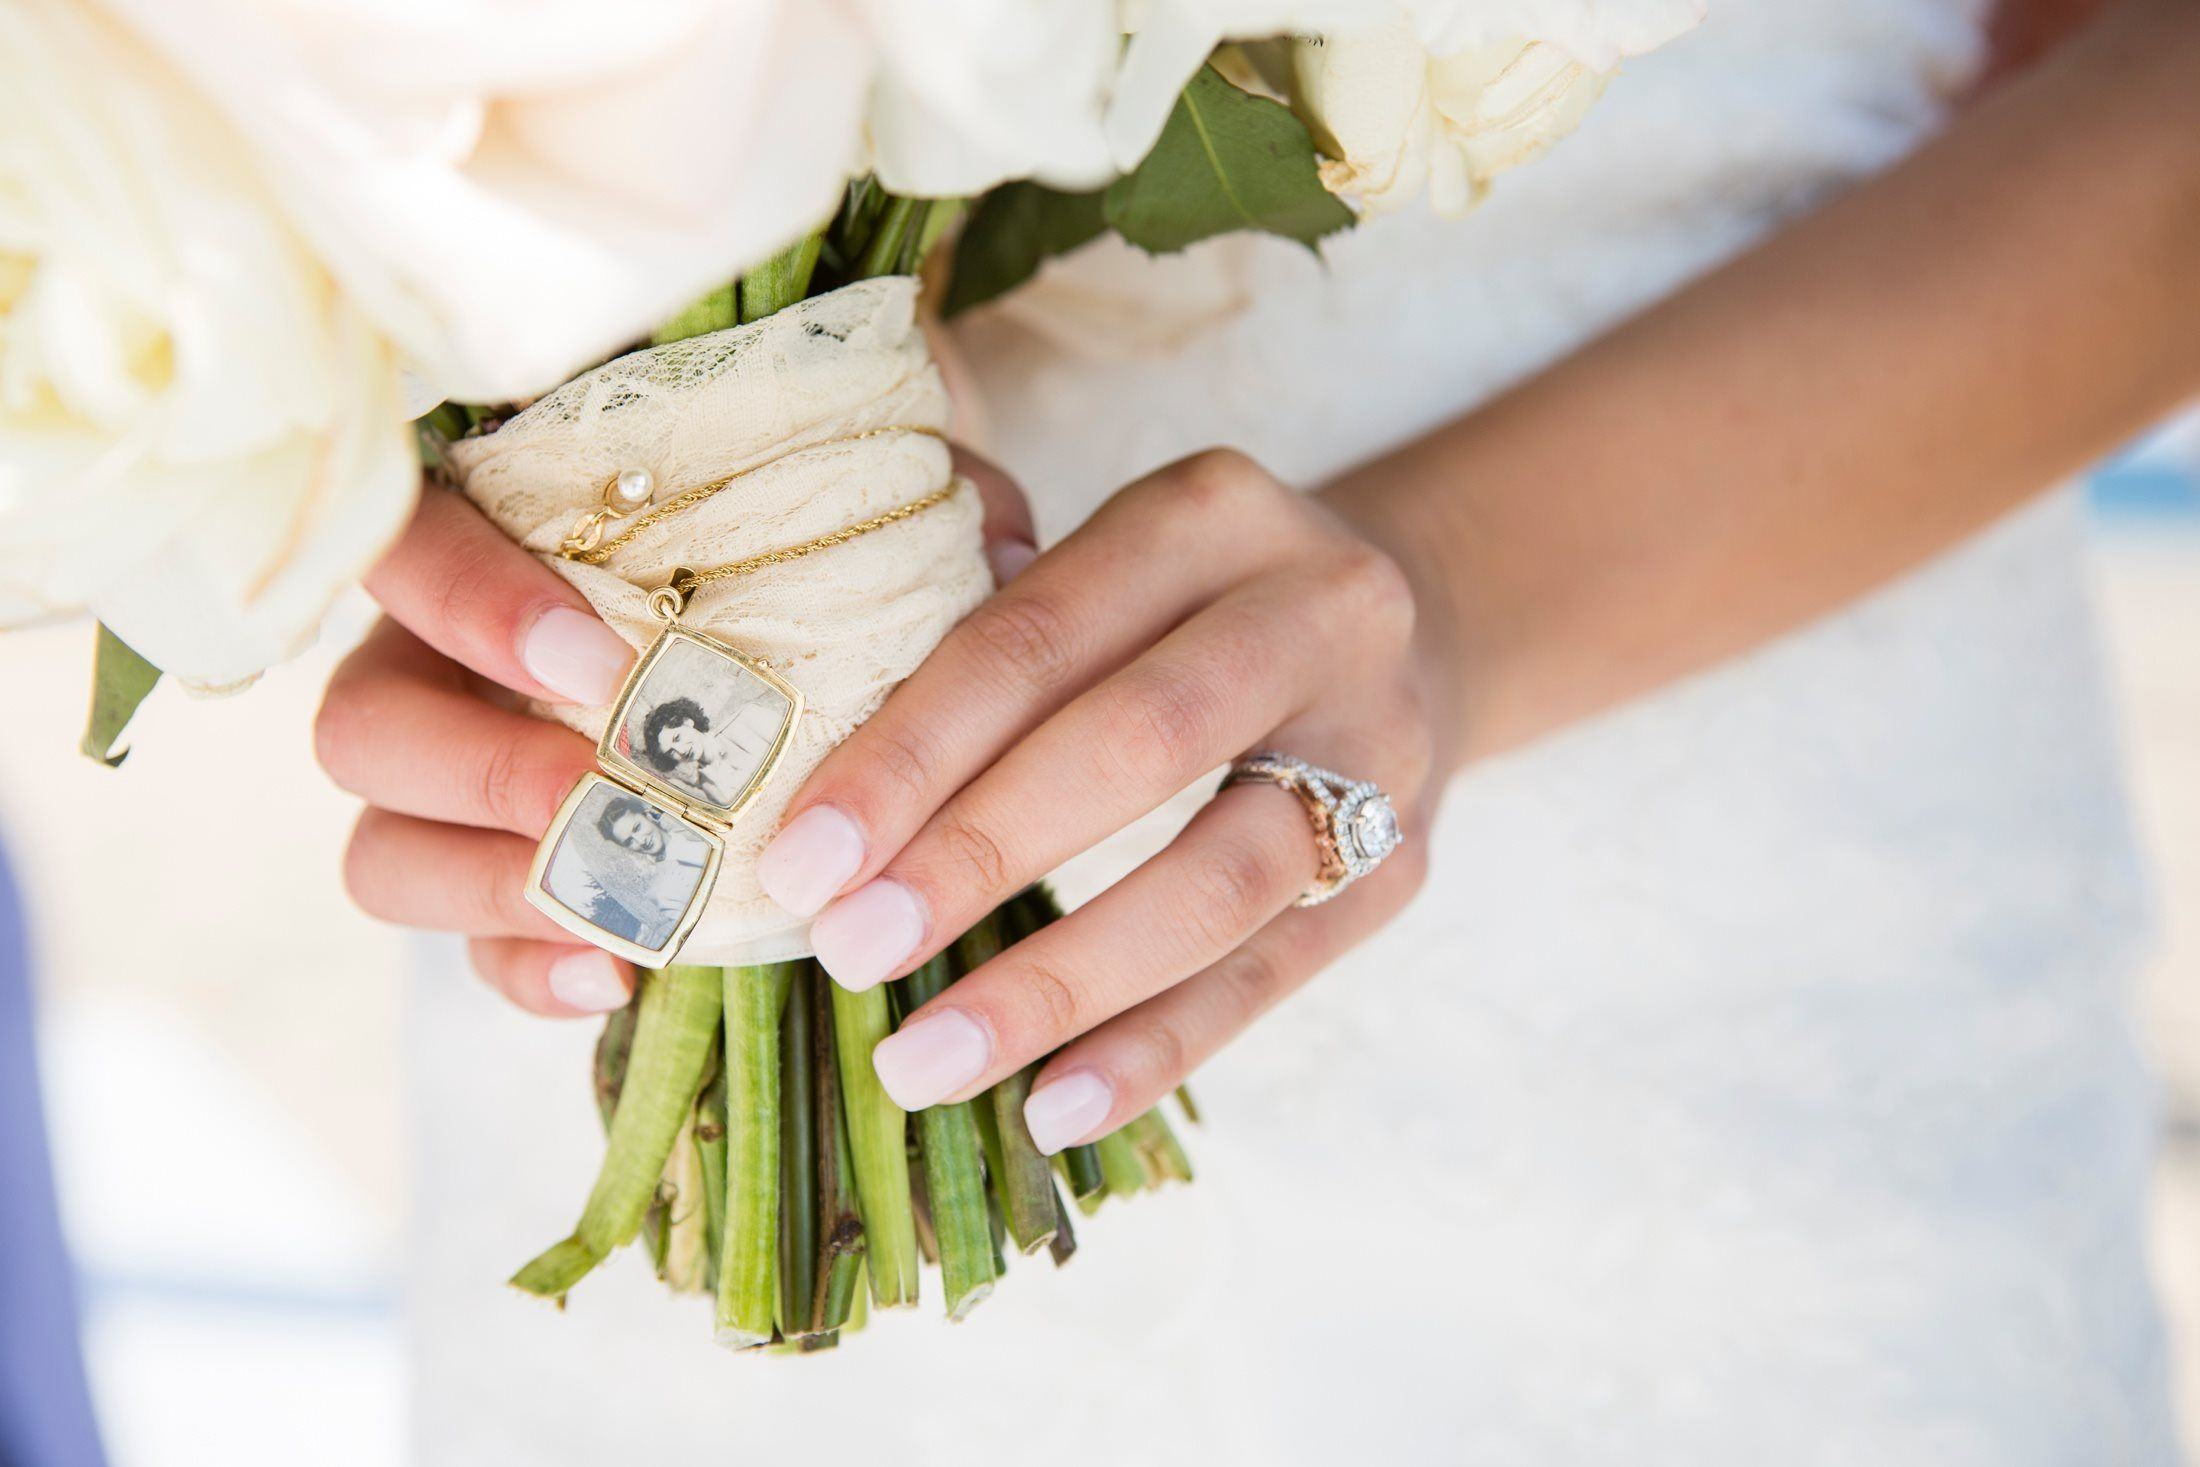 pure lavish events | beach wedding | malibu wedding | sand ceremony | lavender wedding | black and purple wedding | katrina jayne | wedding flowers | art with nature | grandmas locket | remembrance